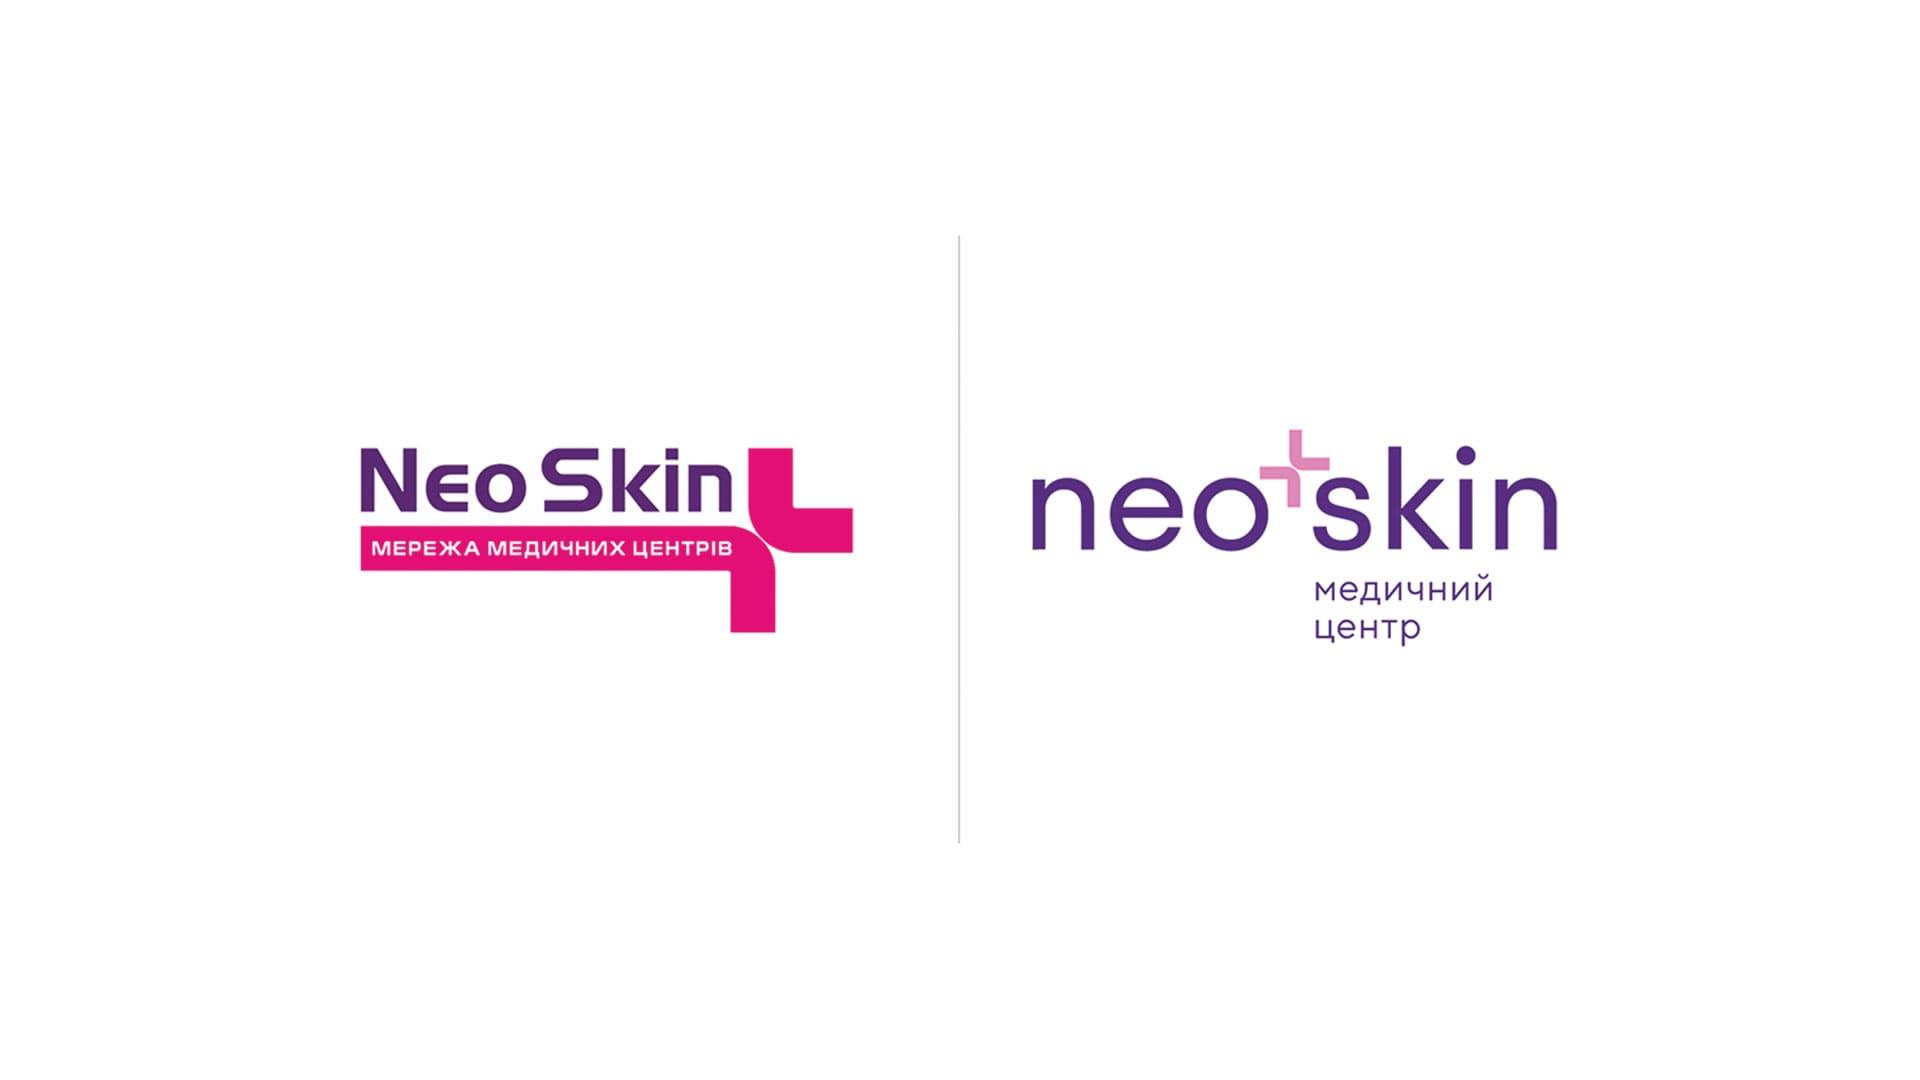 gra brand design neo skin 2